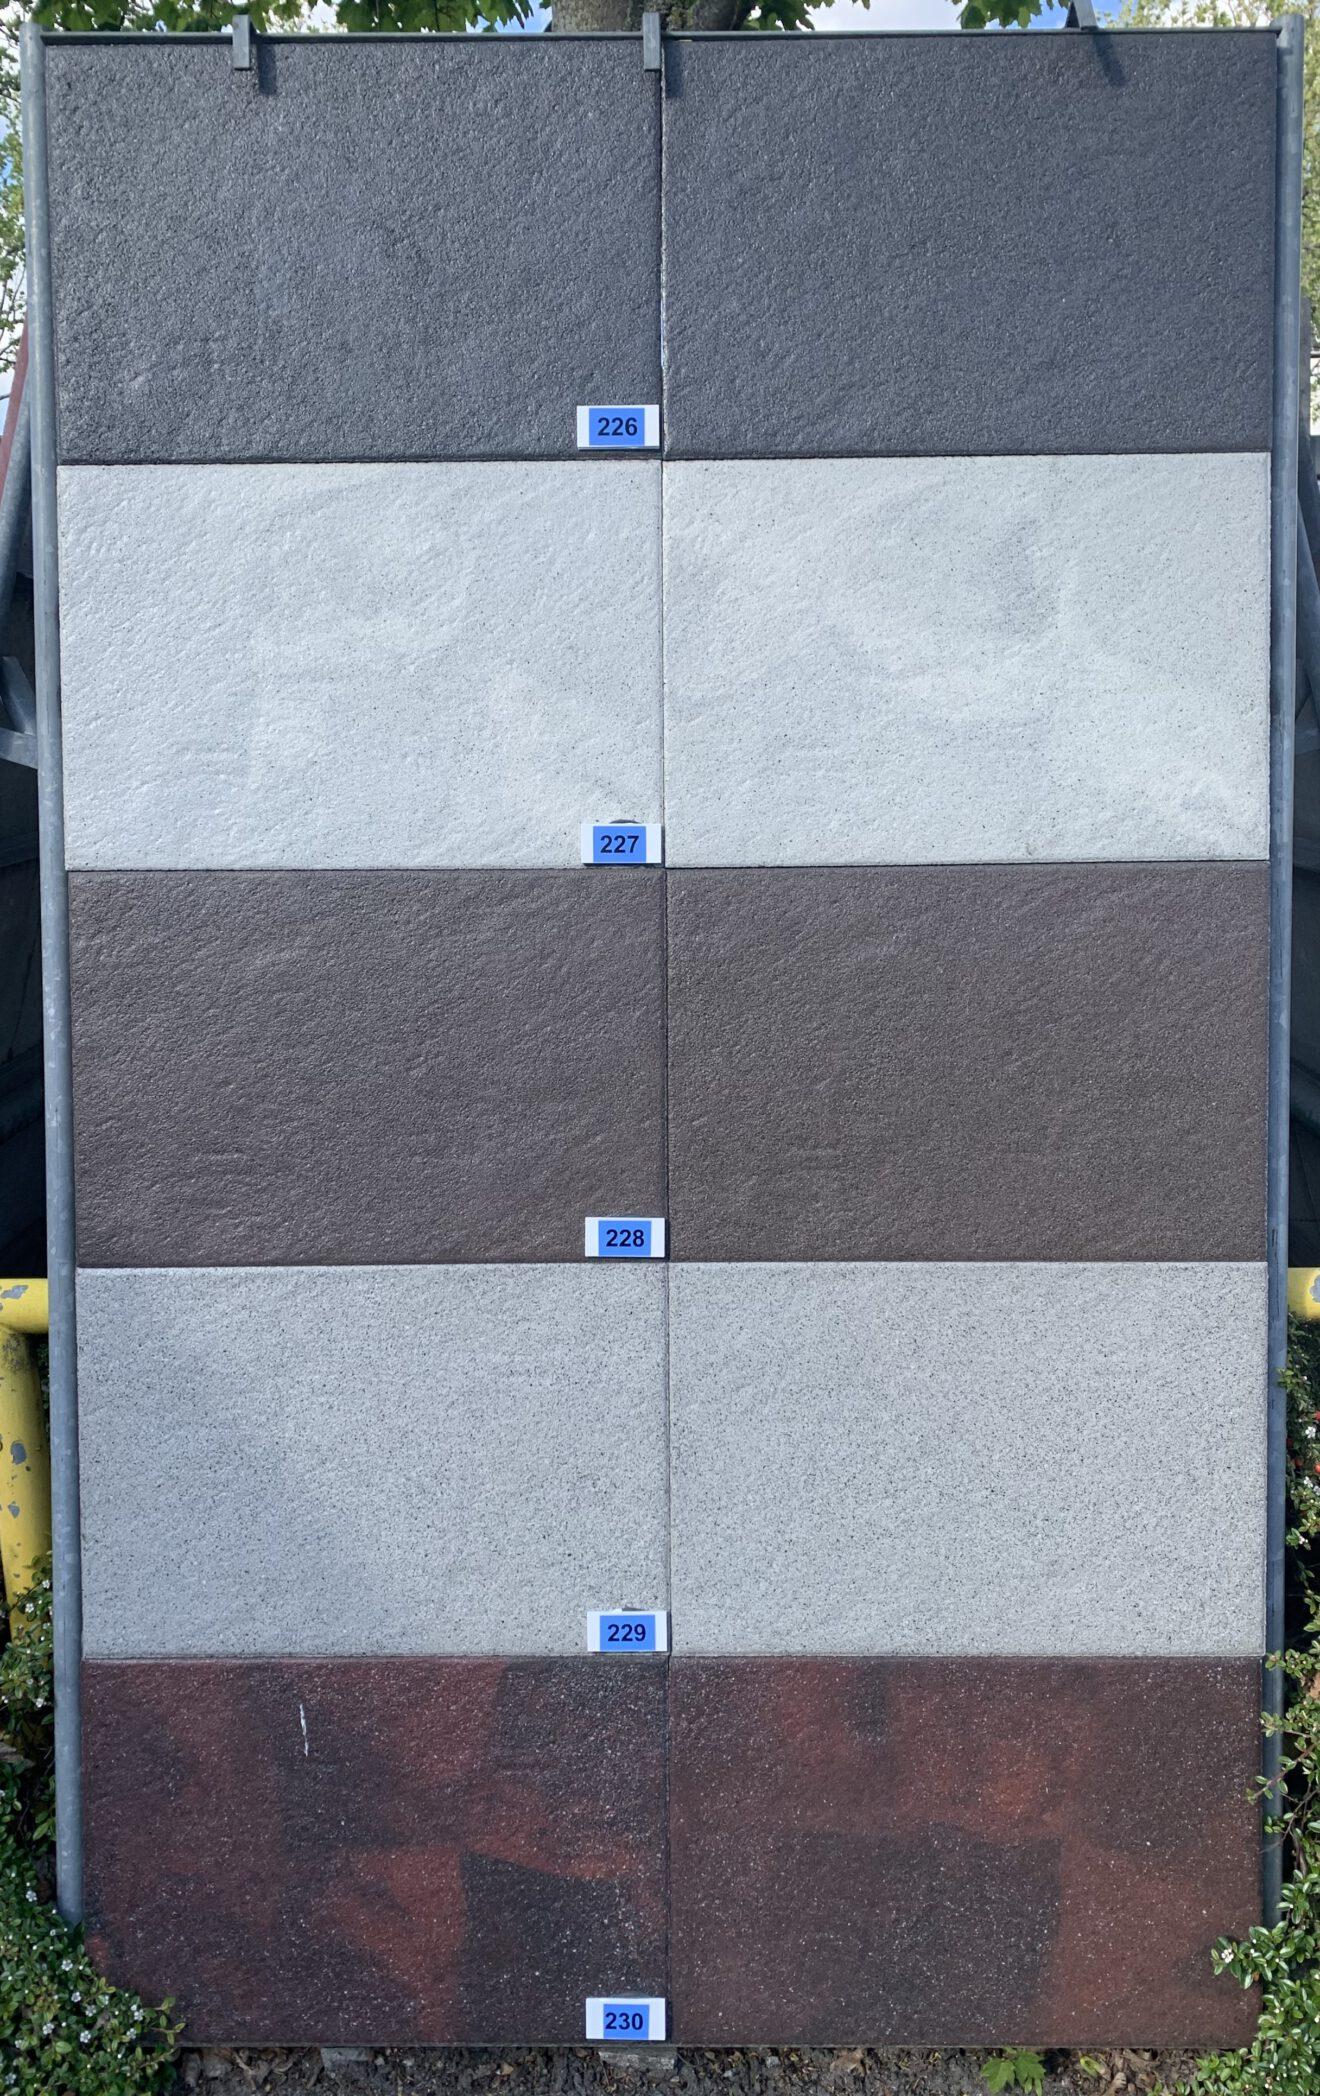 Bartels 226 Novaclean Melbourne - dunkelgrau Pflasterplatten bei Stolzenbach Baustoffe in Bremen kaufen